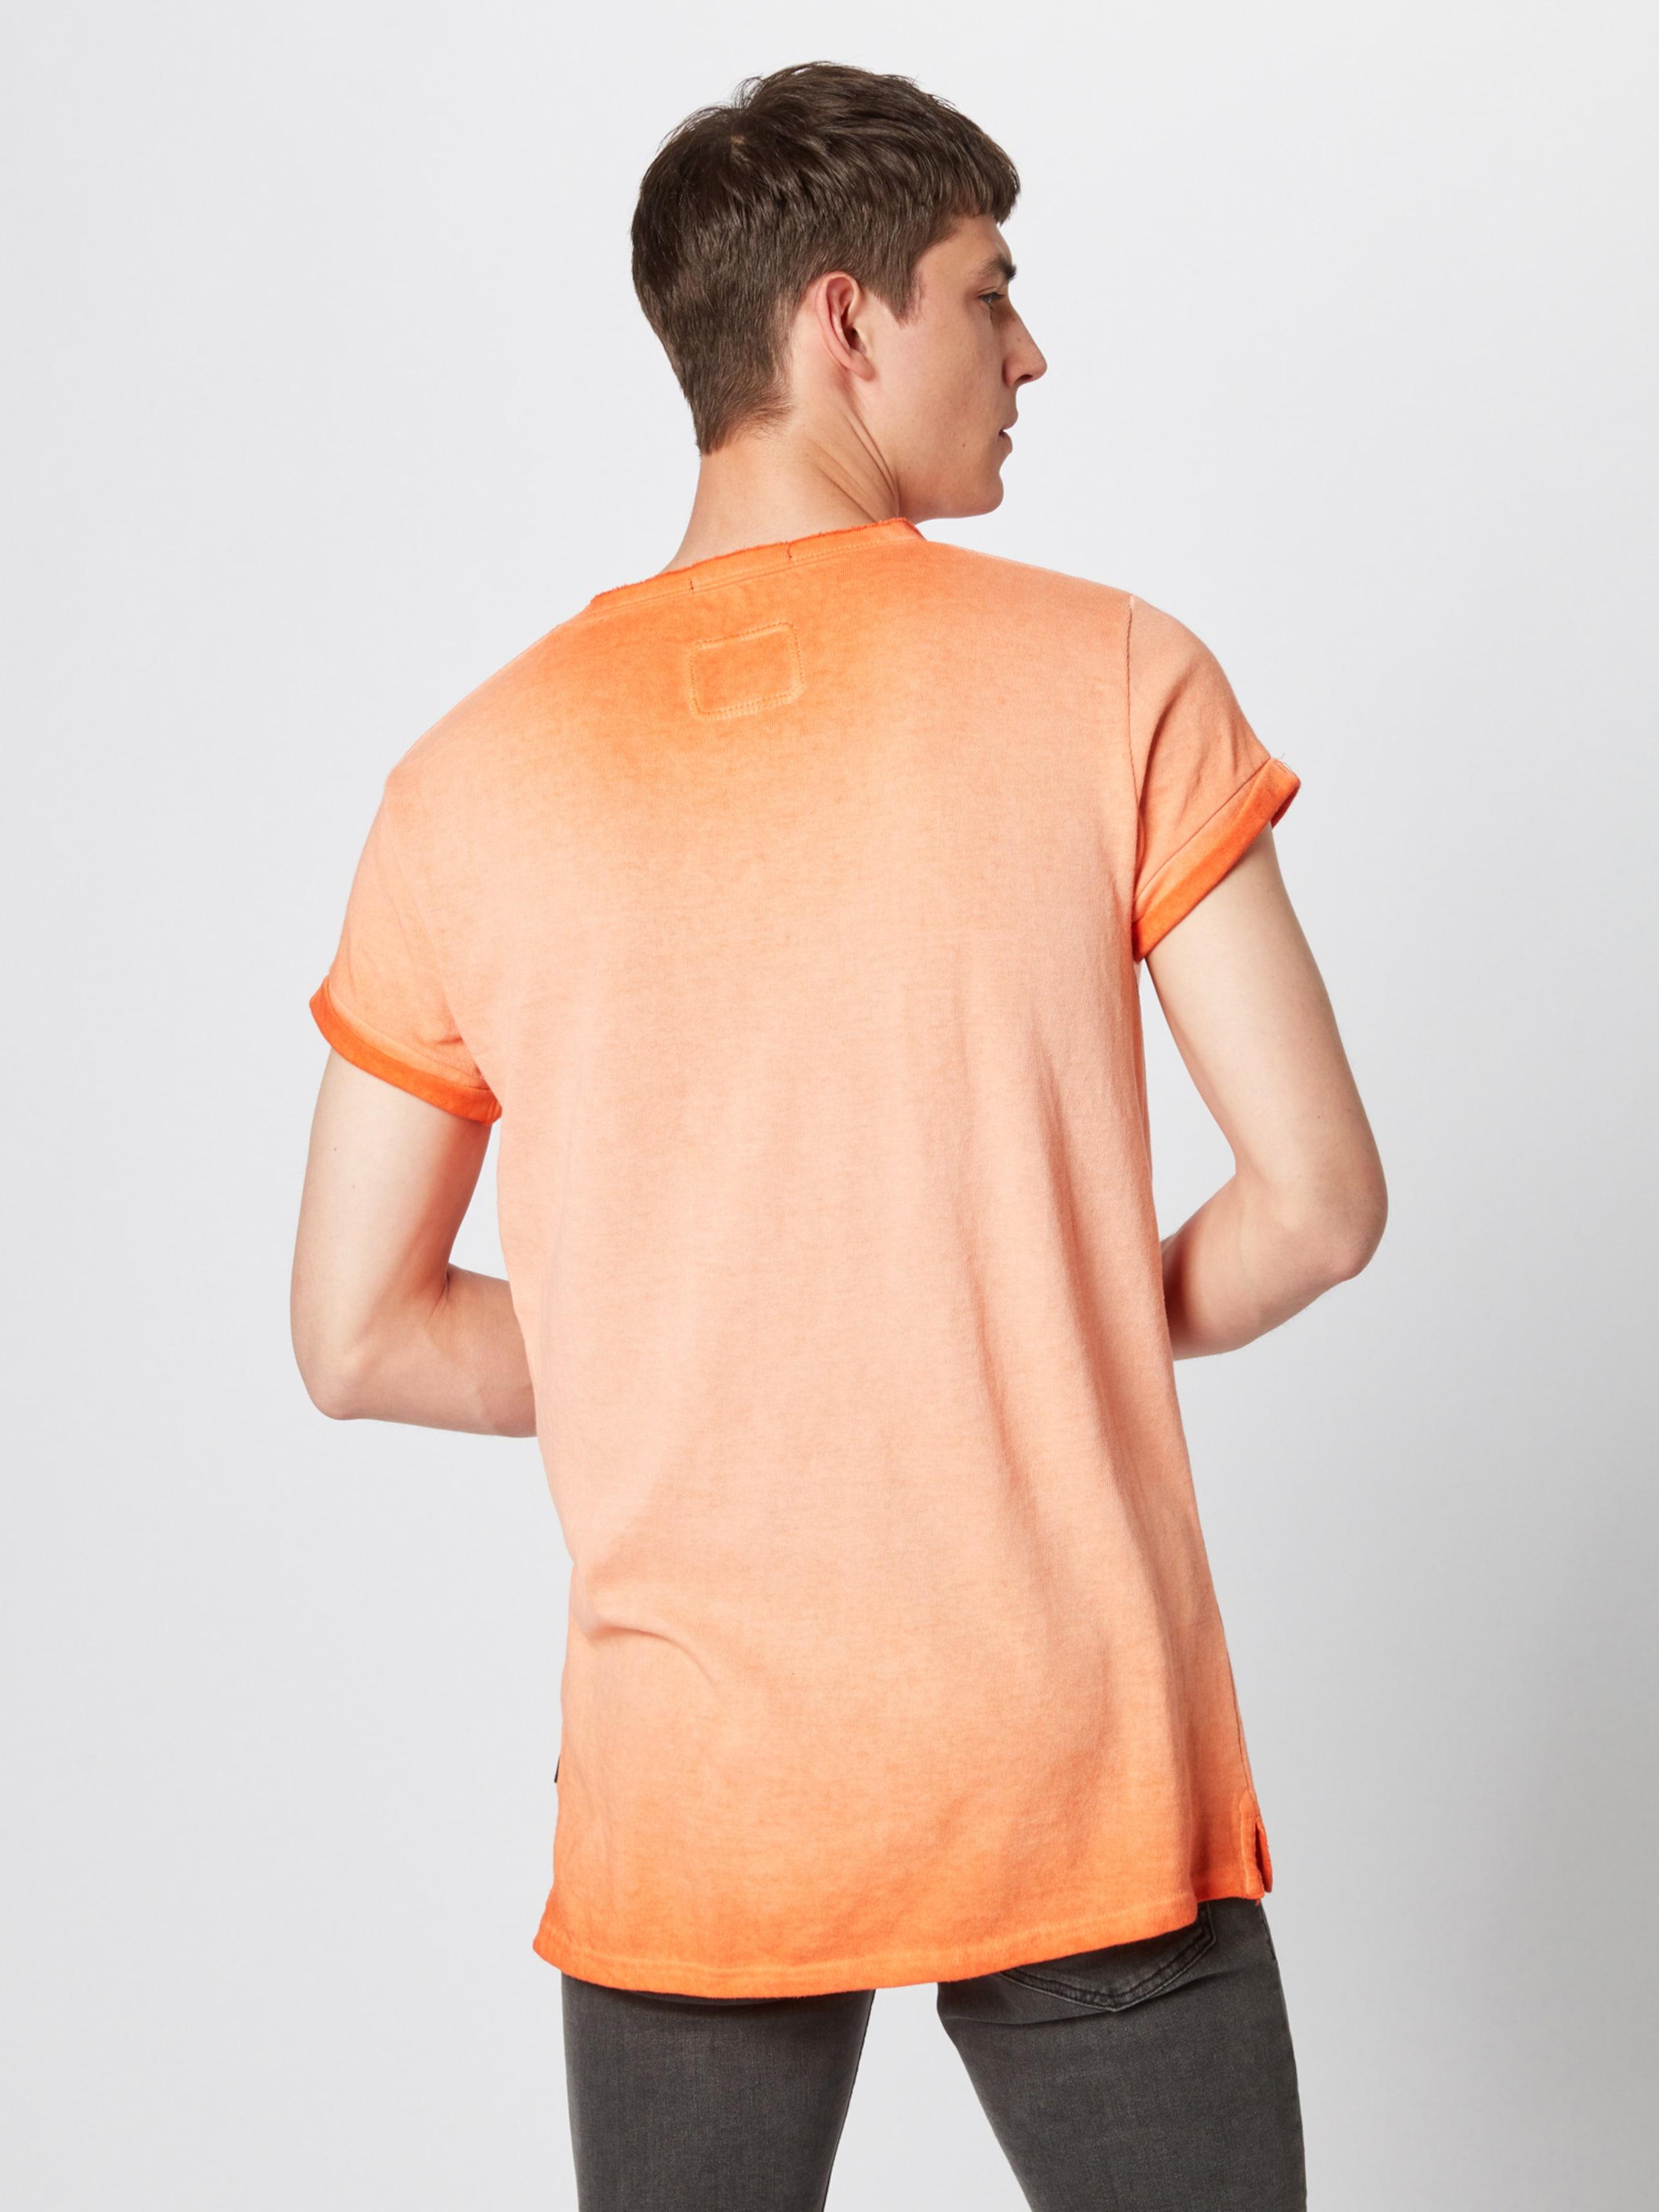 'maurice' In Orange Orange 'maurice' Tigha Shirt Shirt In Tigha 3RjS5A4Lqc